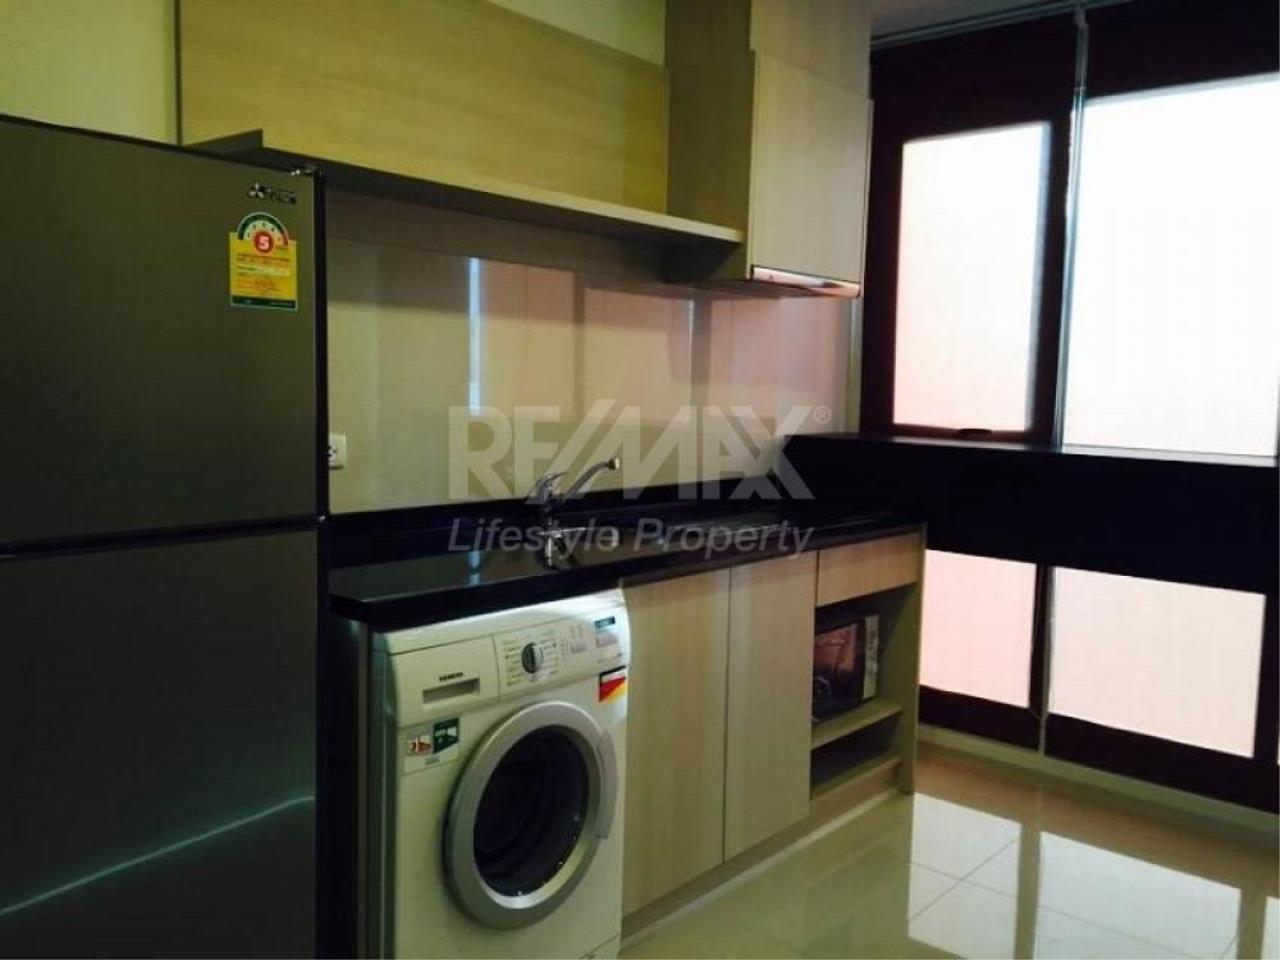 RE/MAX LifeStyle Property Agency's Rhythm Sathorn - Narathiwas 7